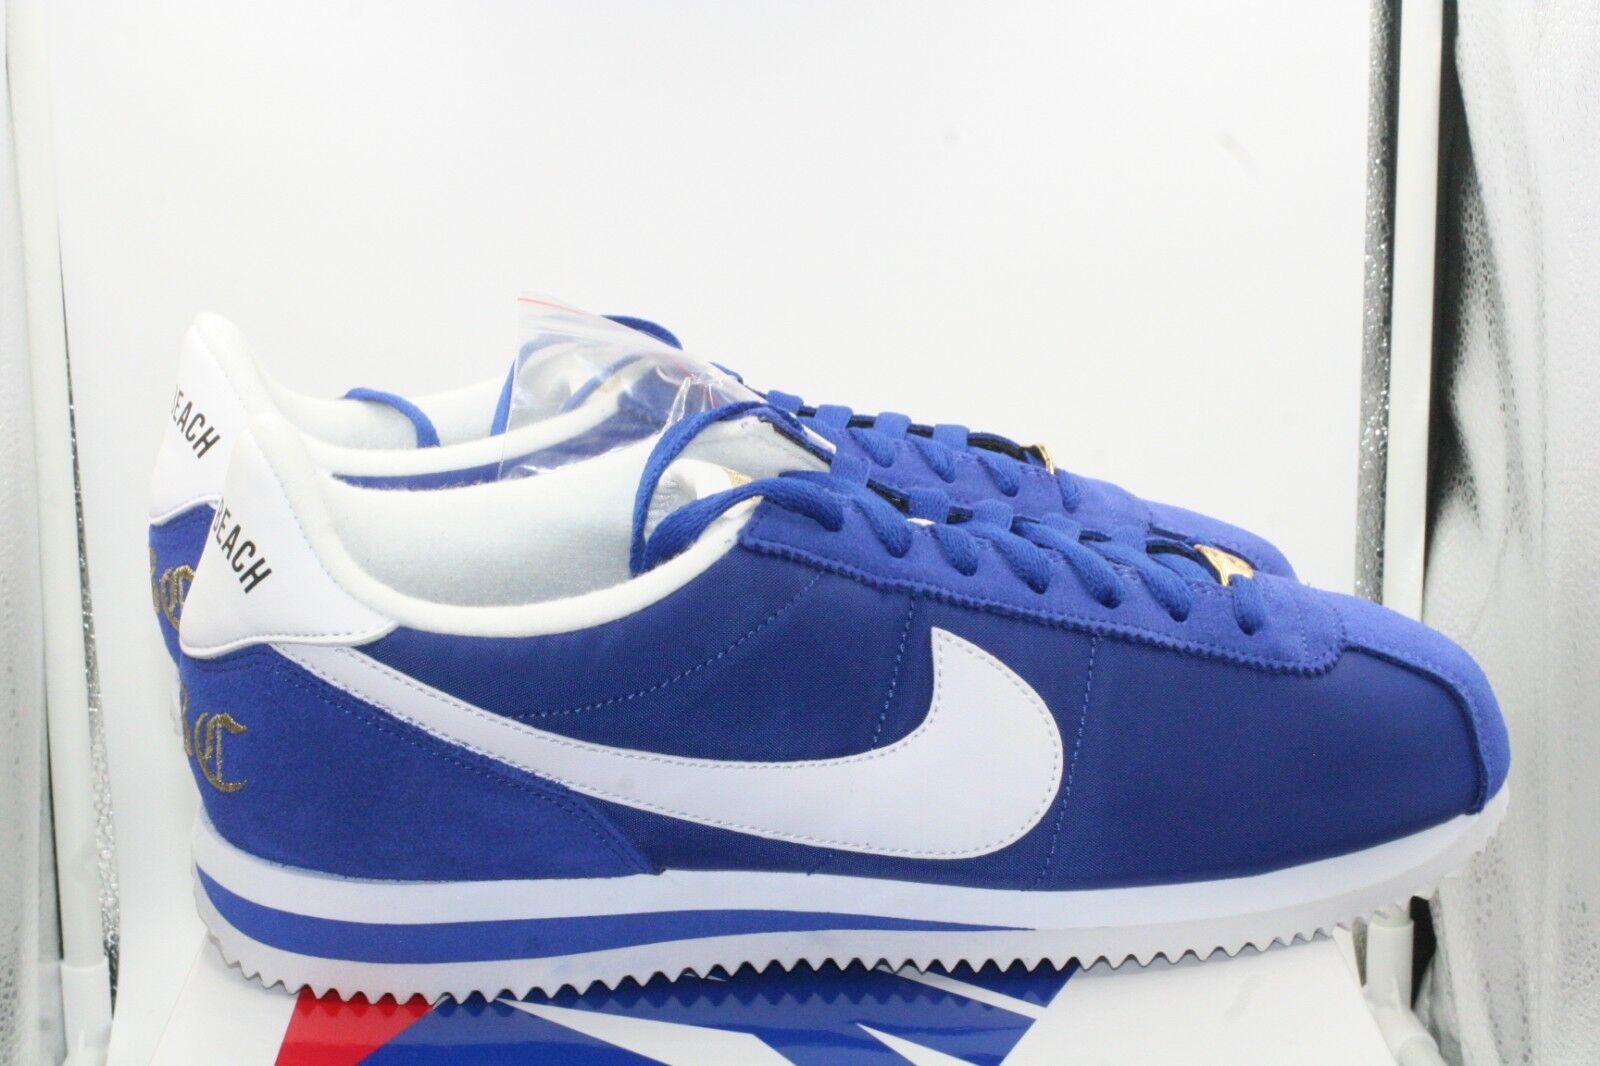 Nike Cortez Basic Nylon Premium LBC Long Beach Sz 10 Old Royal bluee White gold